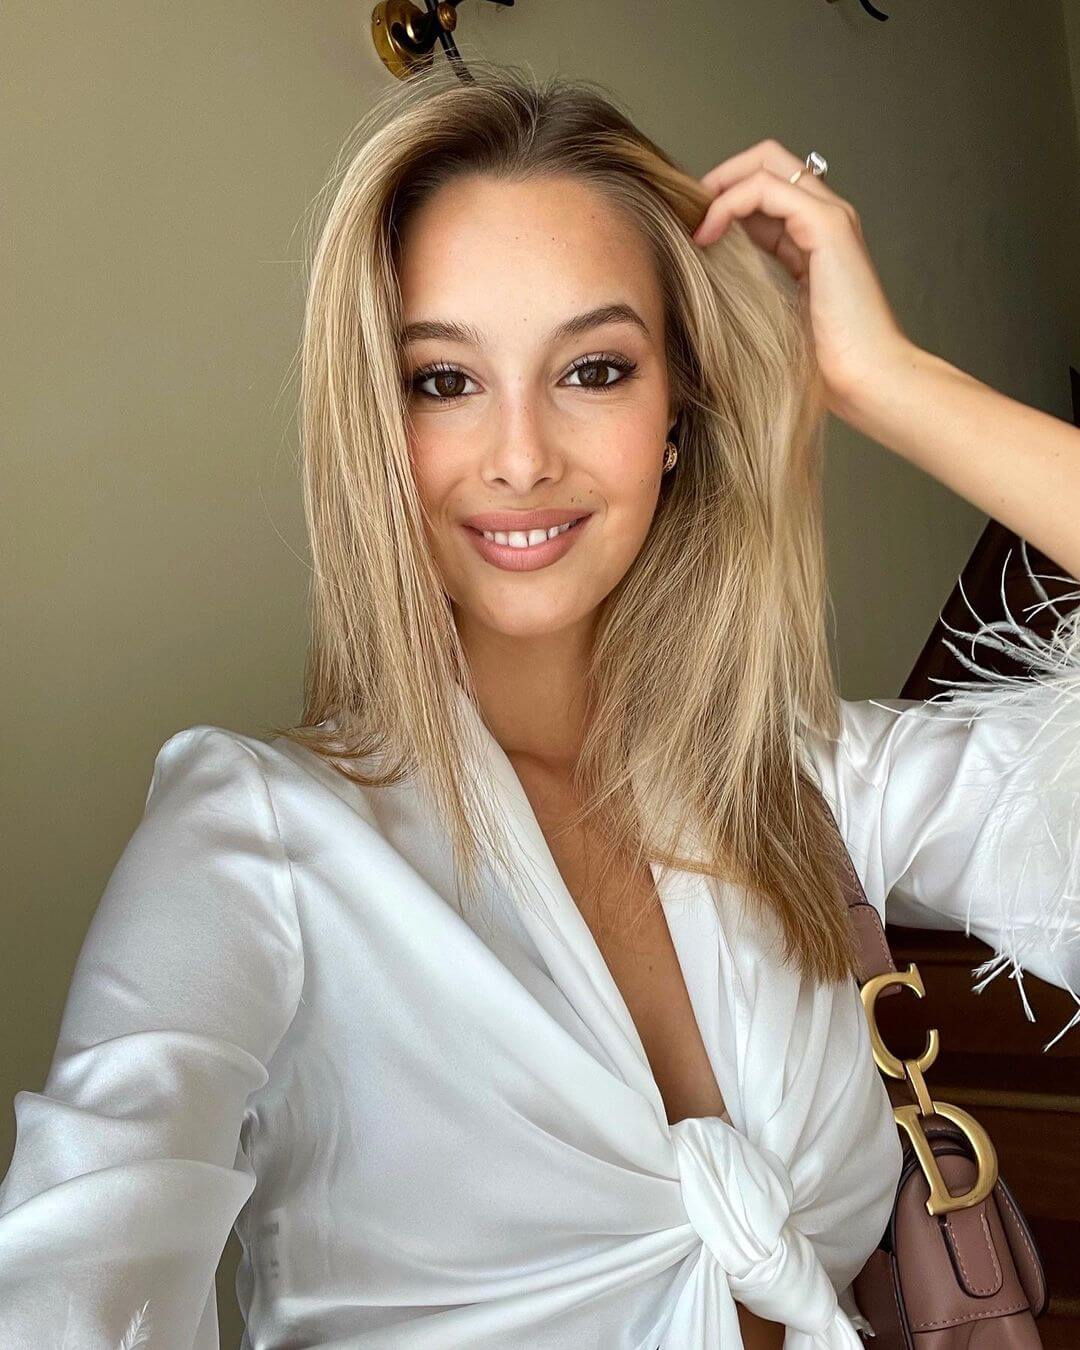 Viktoria Varga